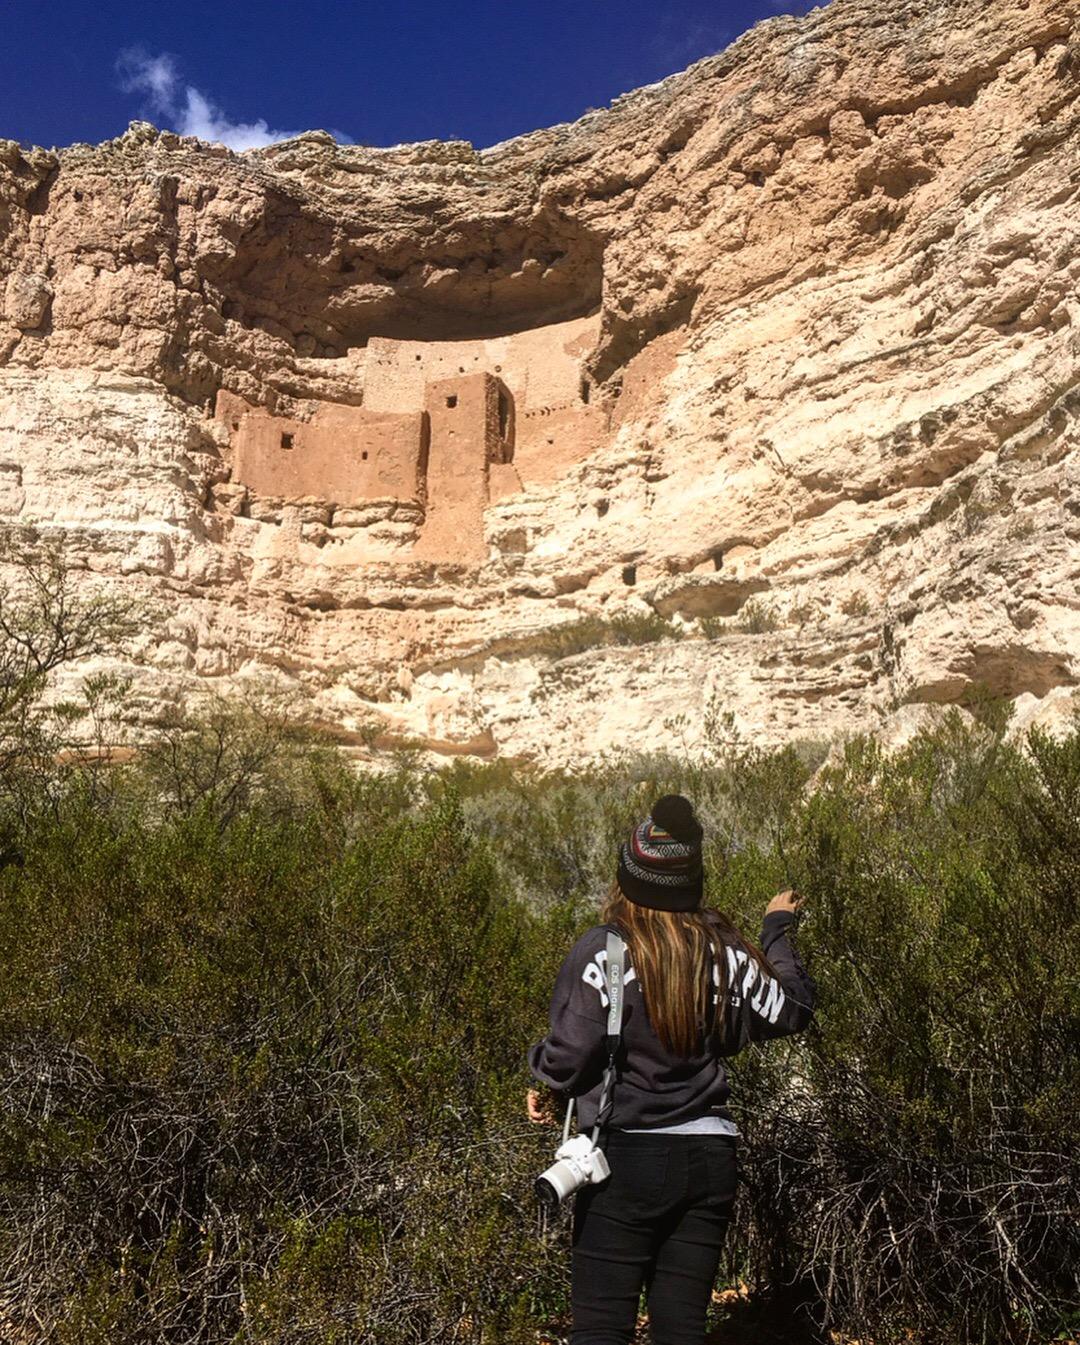 Camp Verde, Arizona: Was Montezuma Castle really Montezuma's Castle? A Look Into This Cliff Dwelling